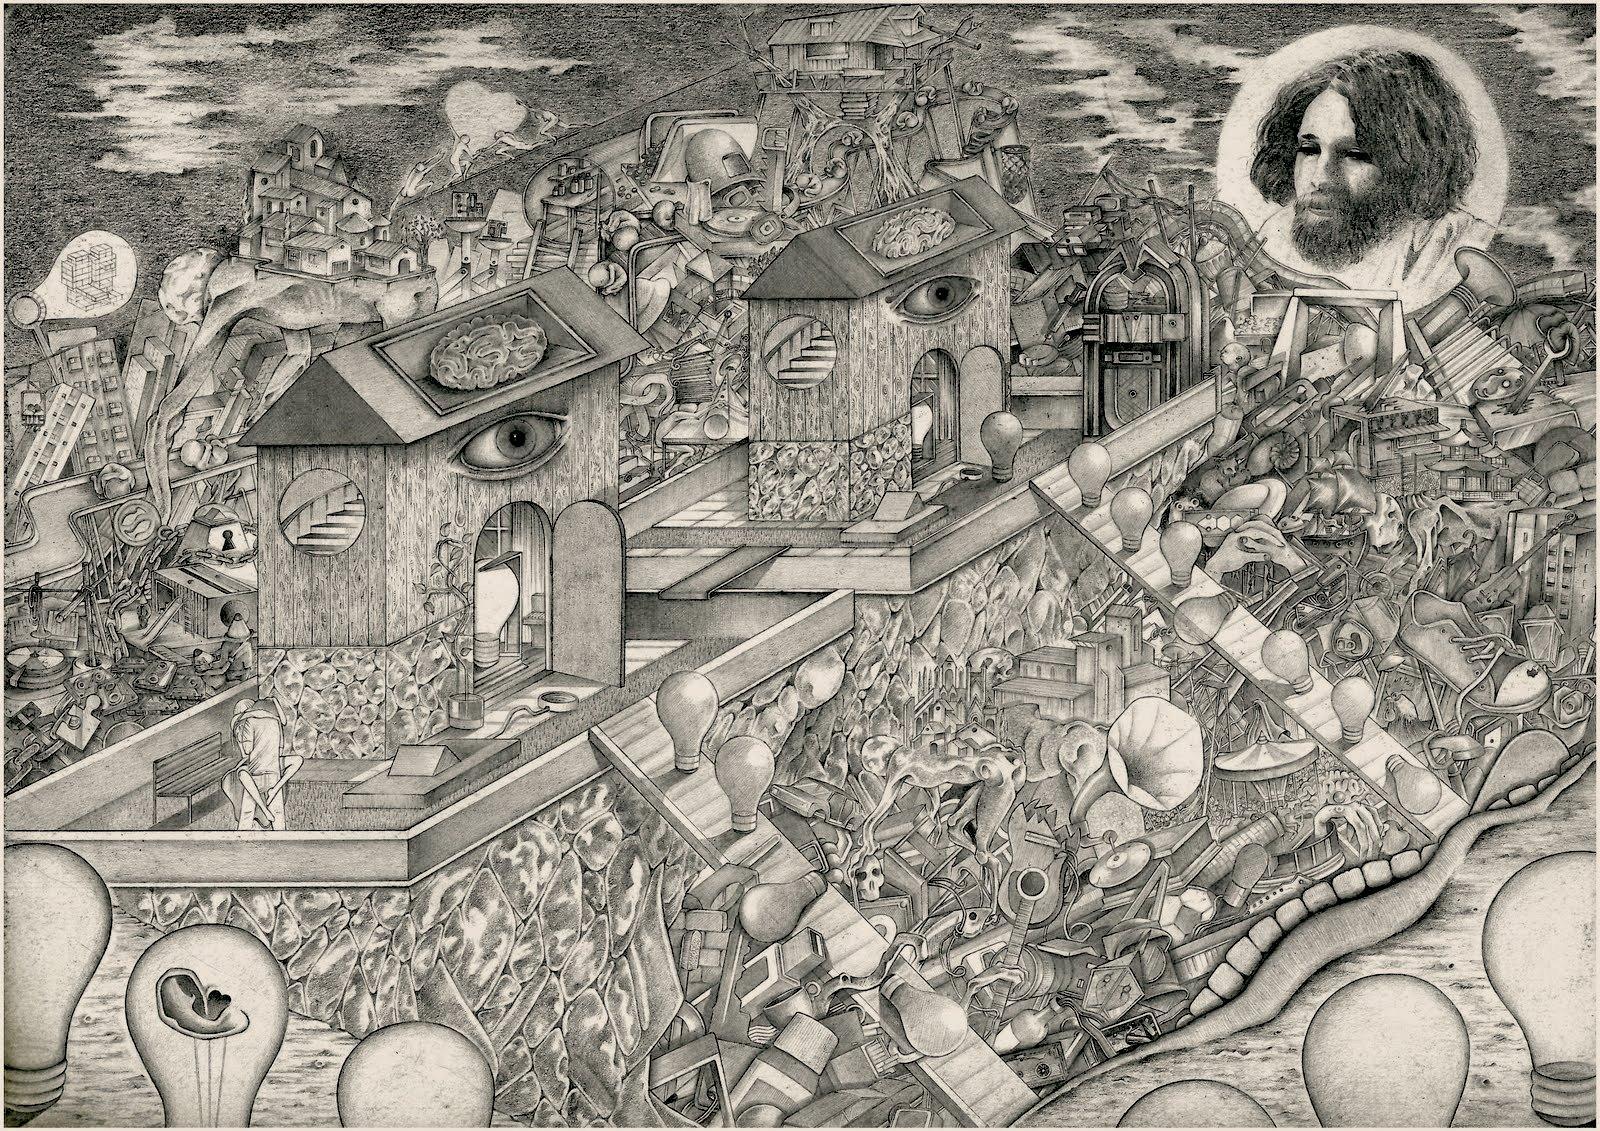 arles-gayo-ilustracion-6